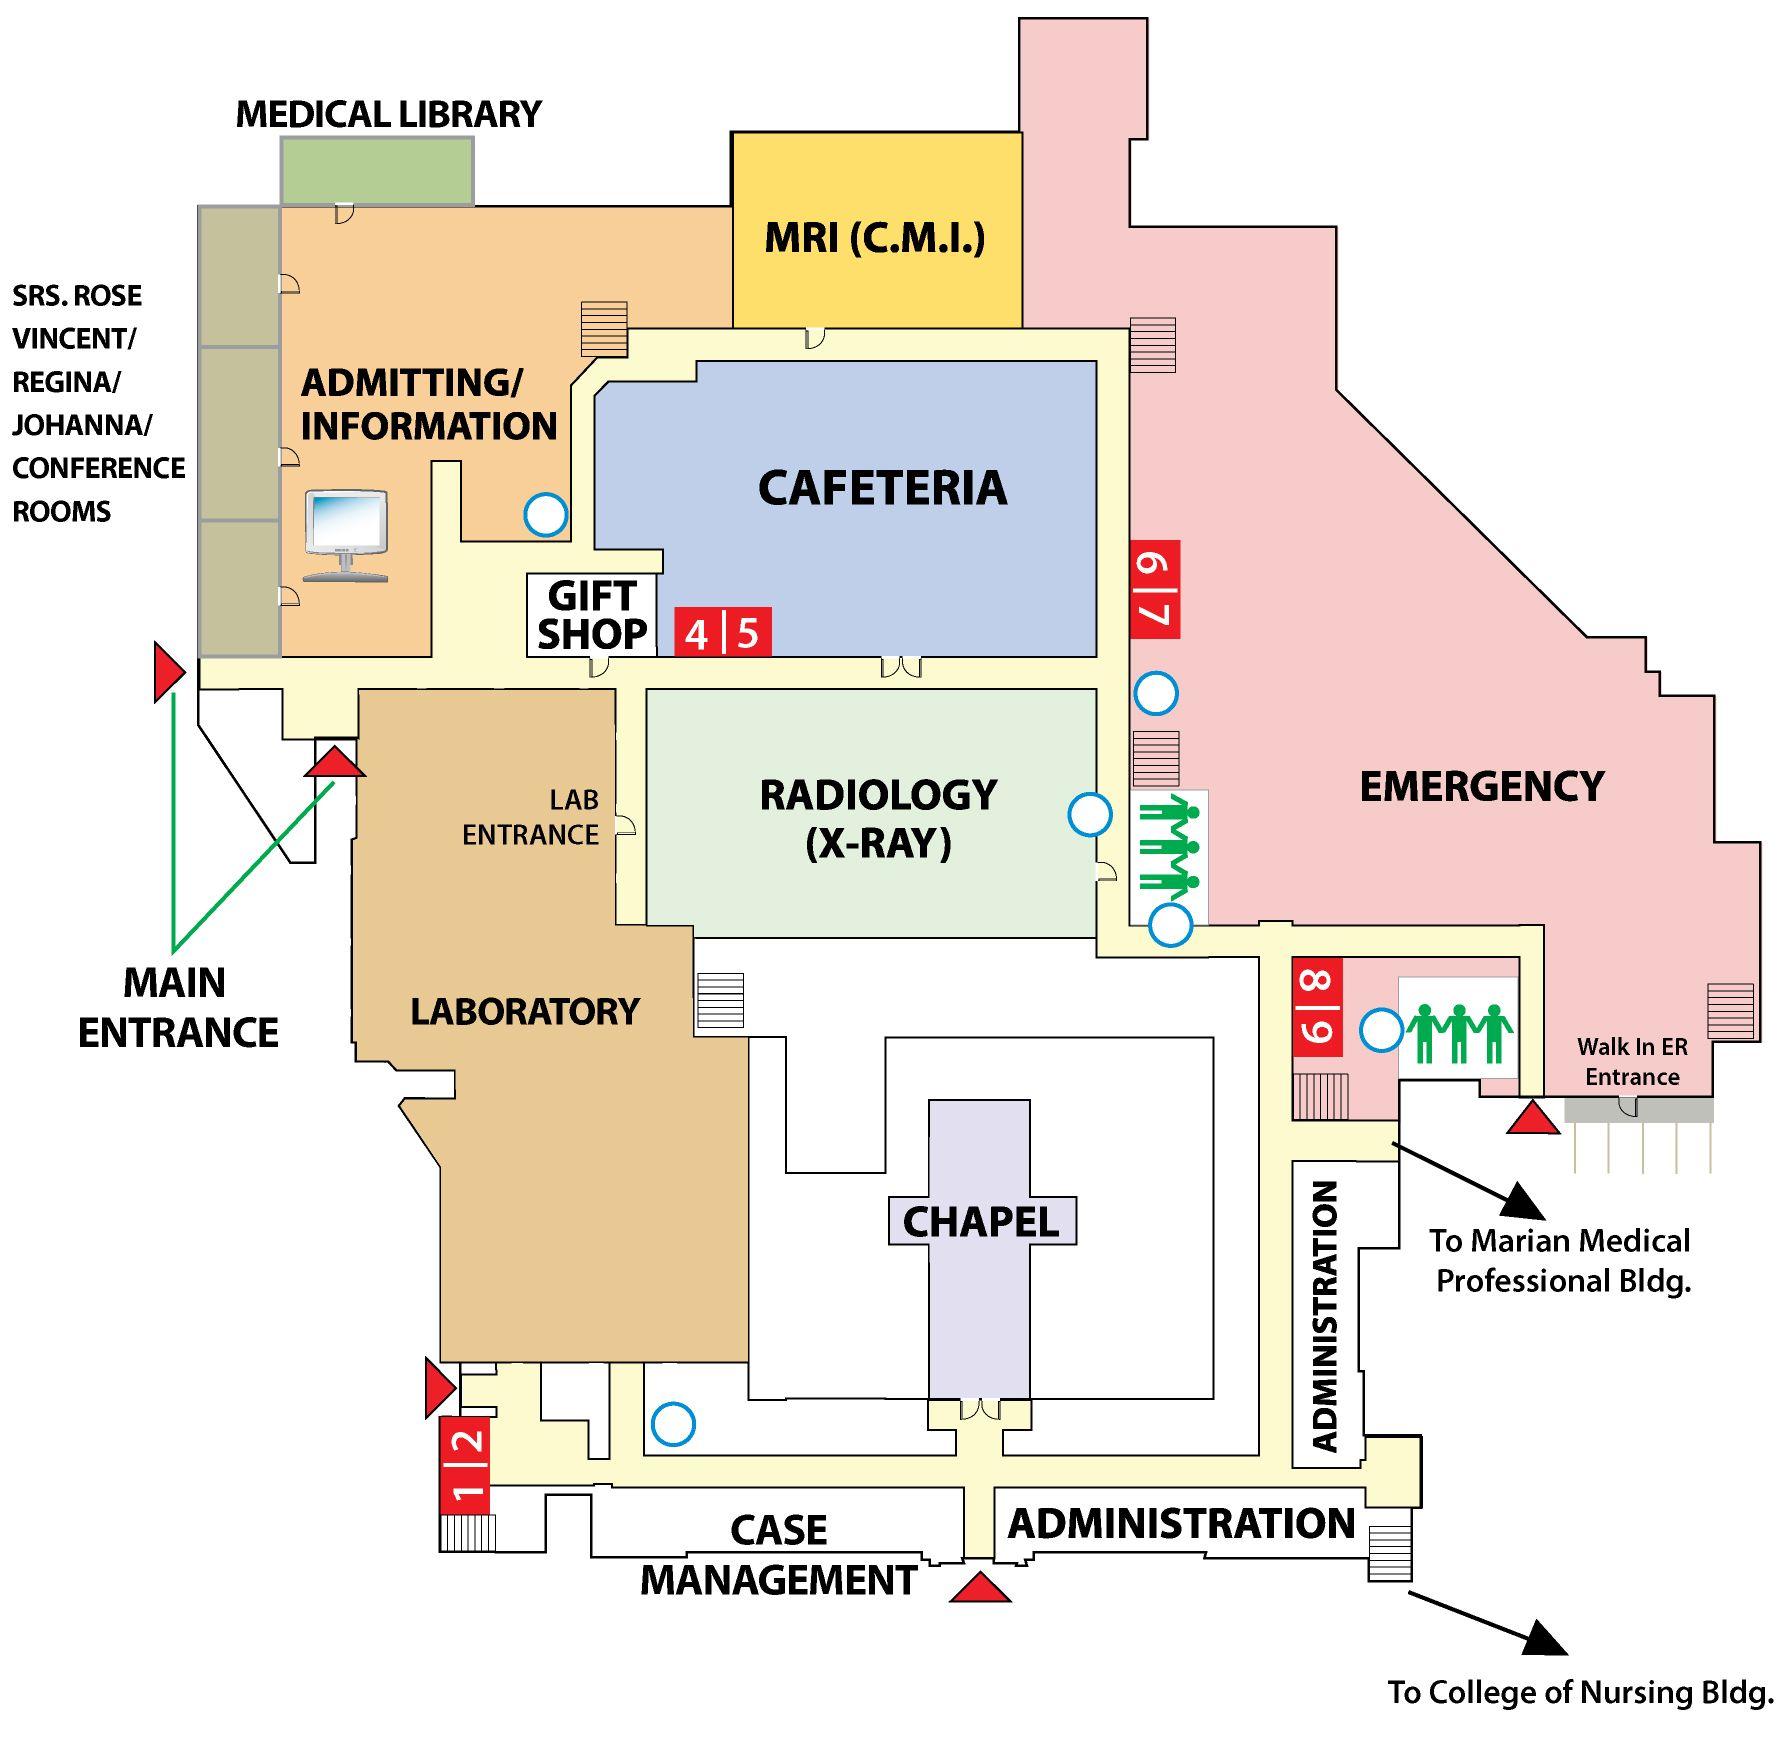 Hospital Layout » St. Elizabeth Medical Center hospital